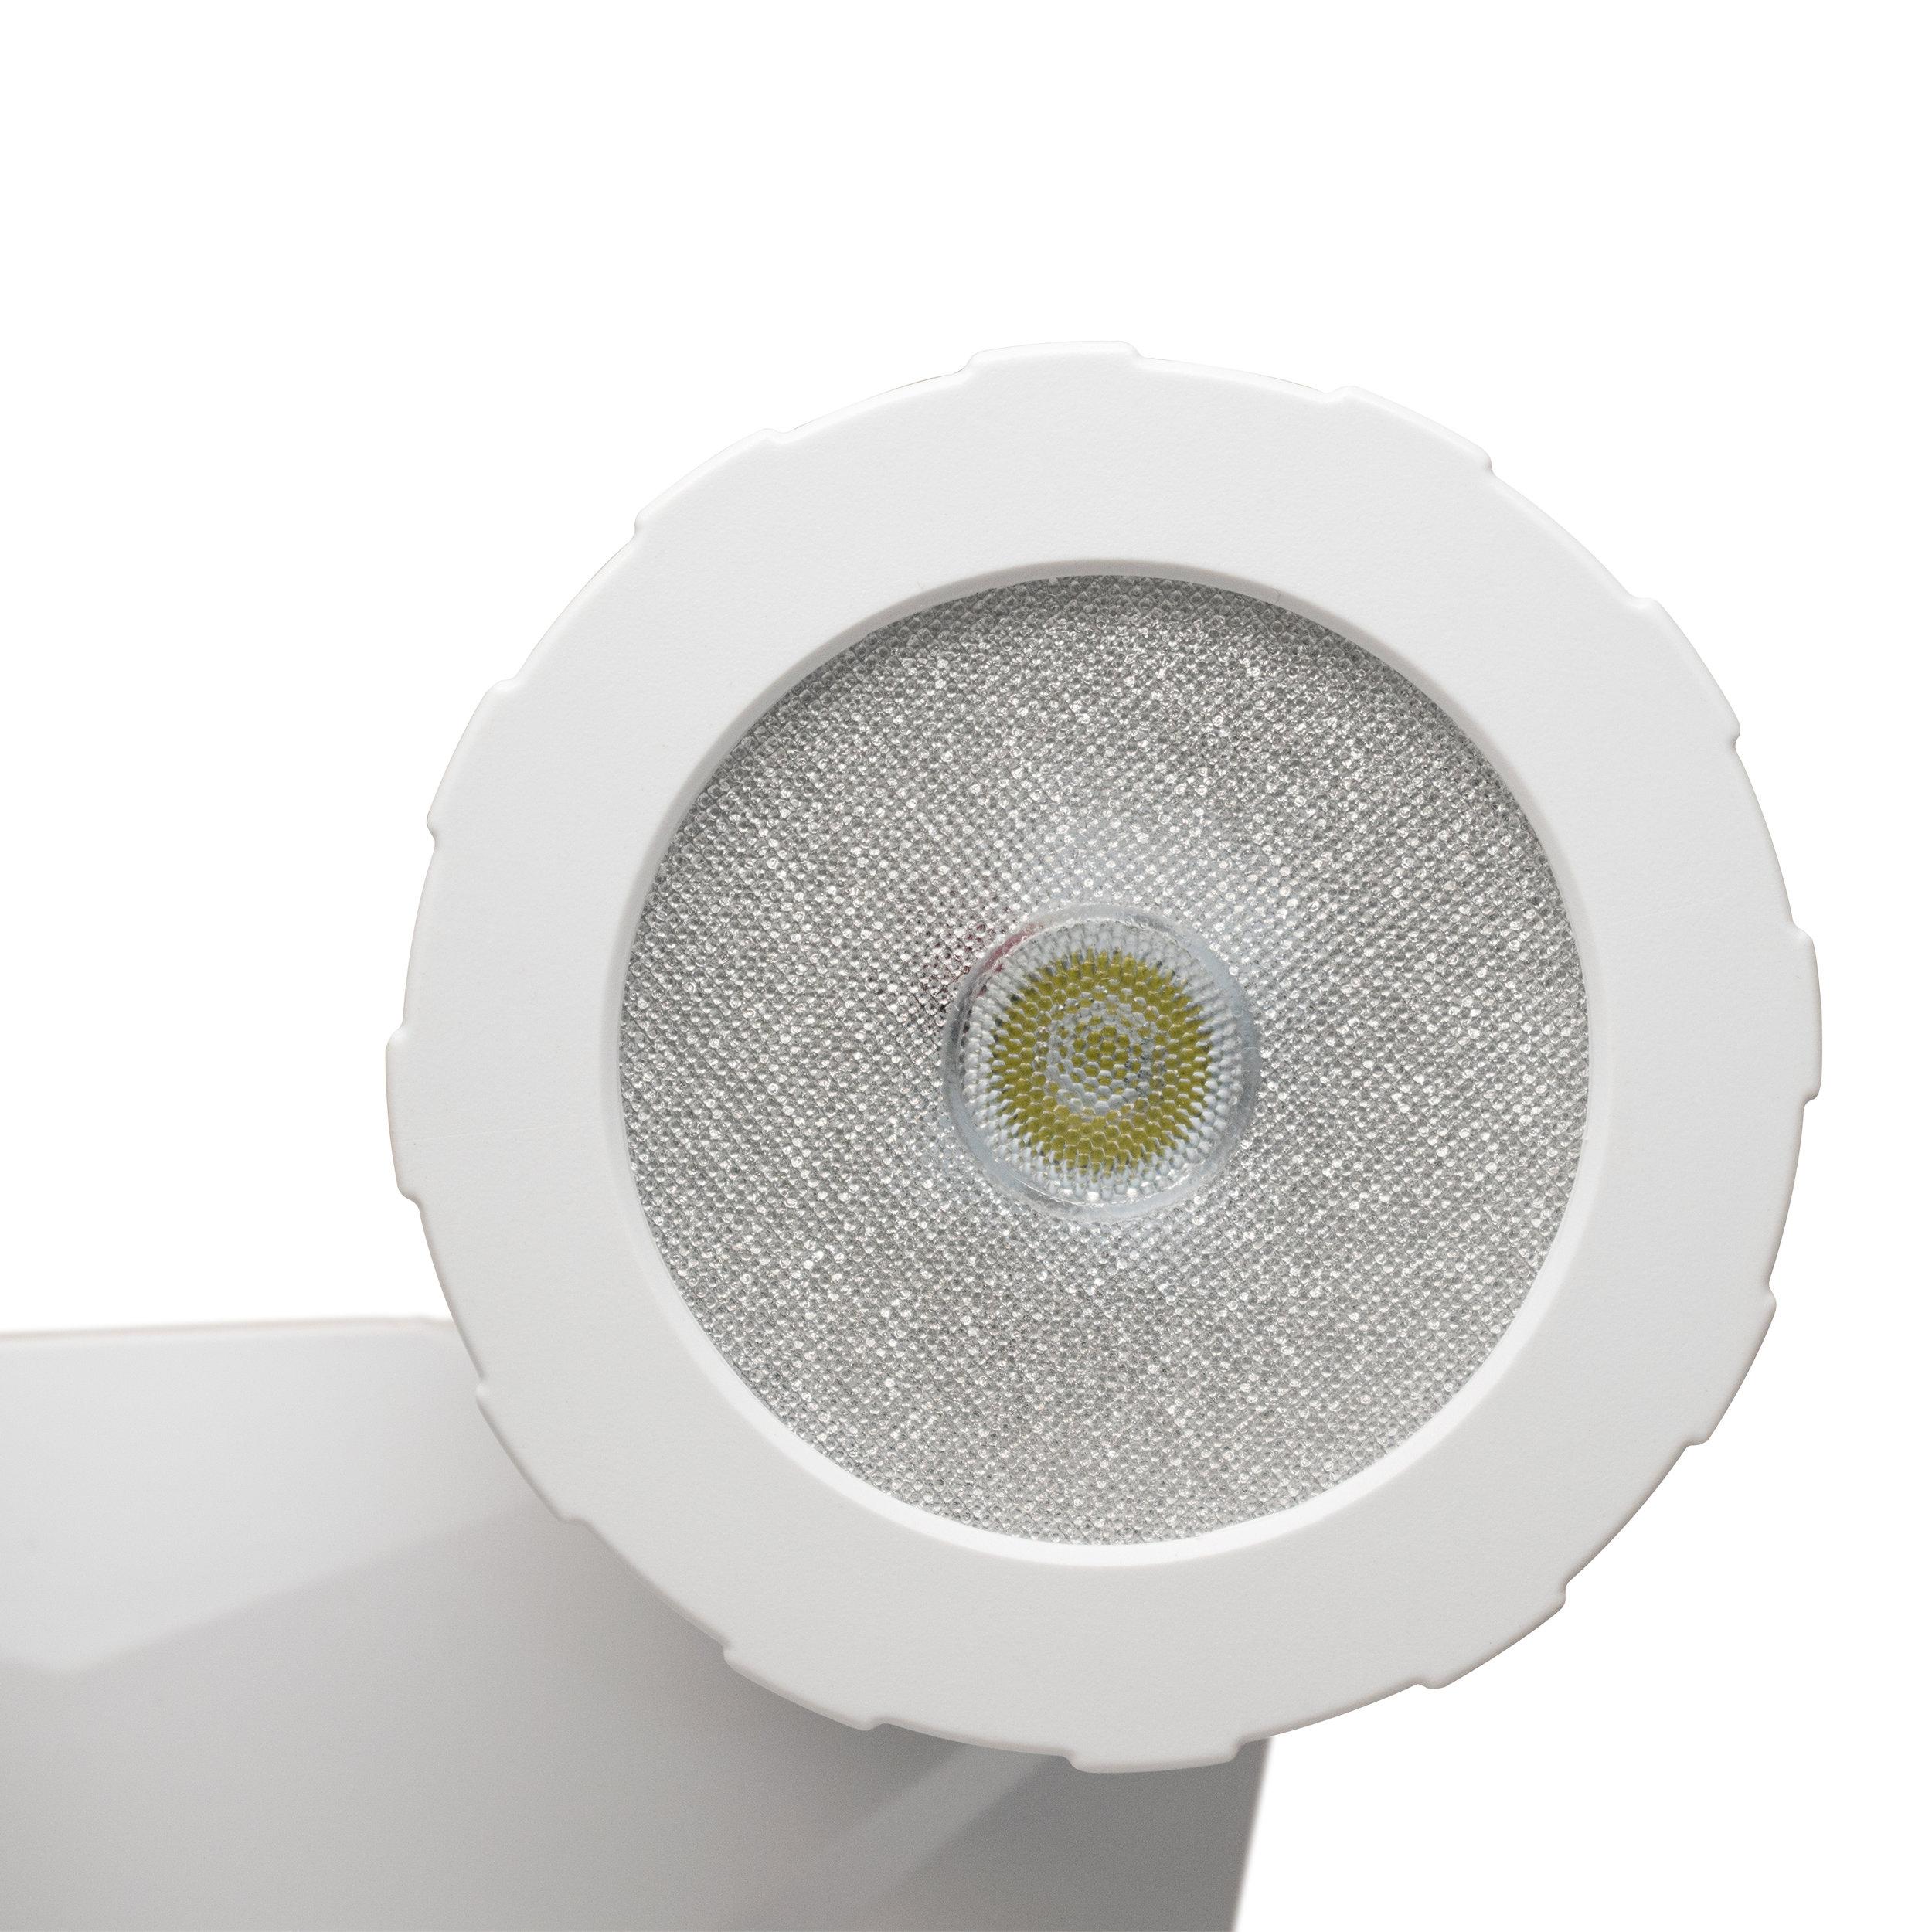 Novolink NL-DSW1 Lamp Head